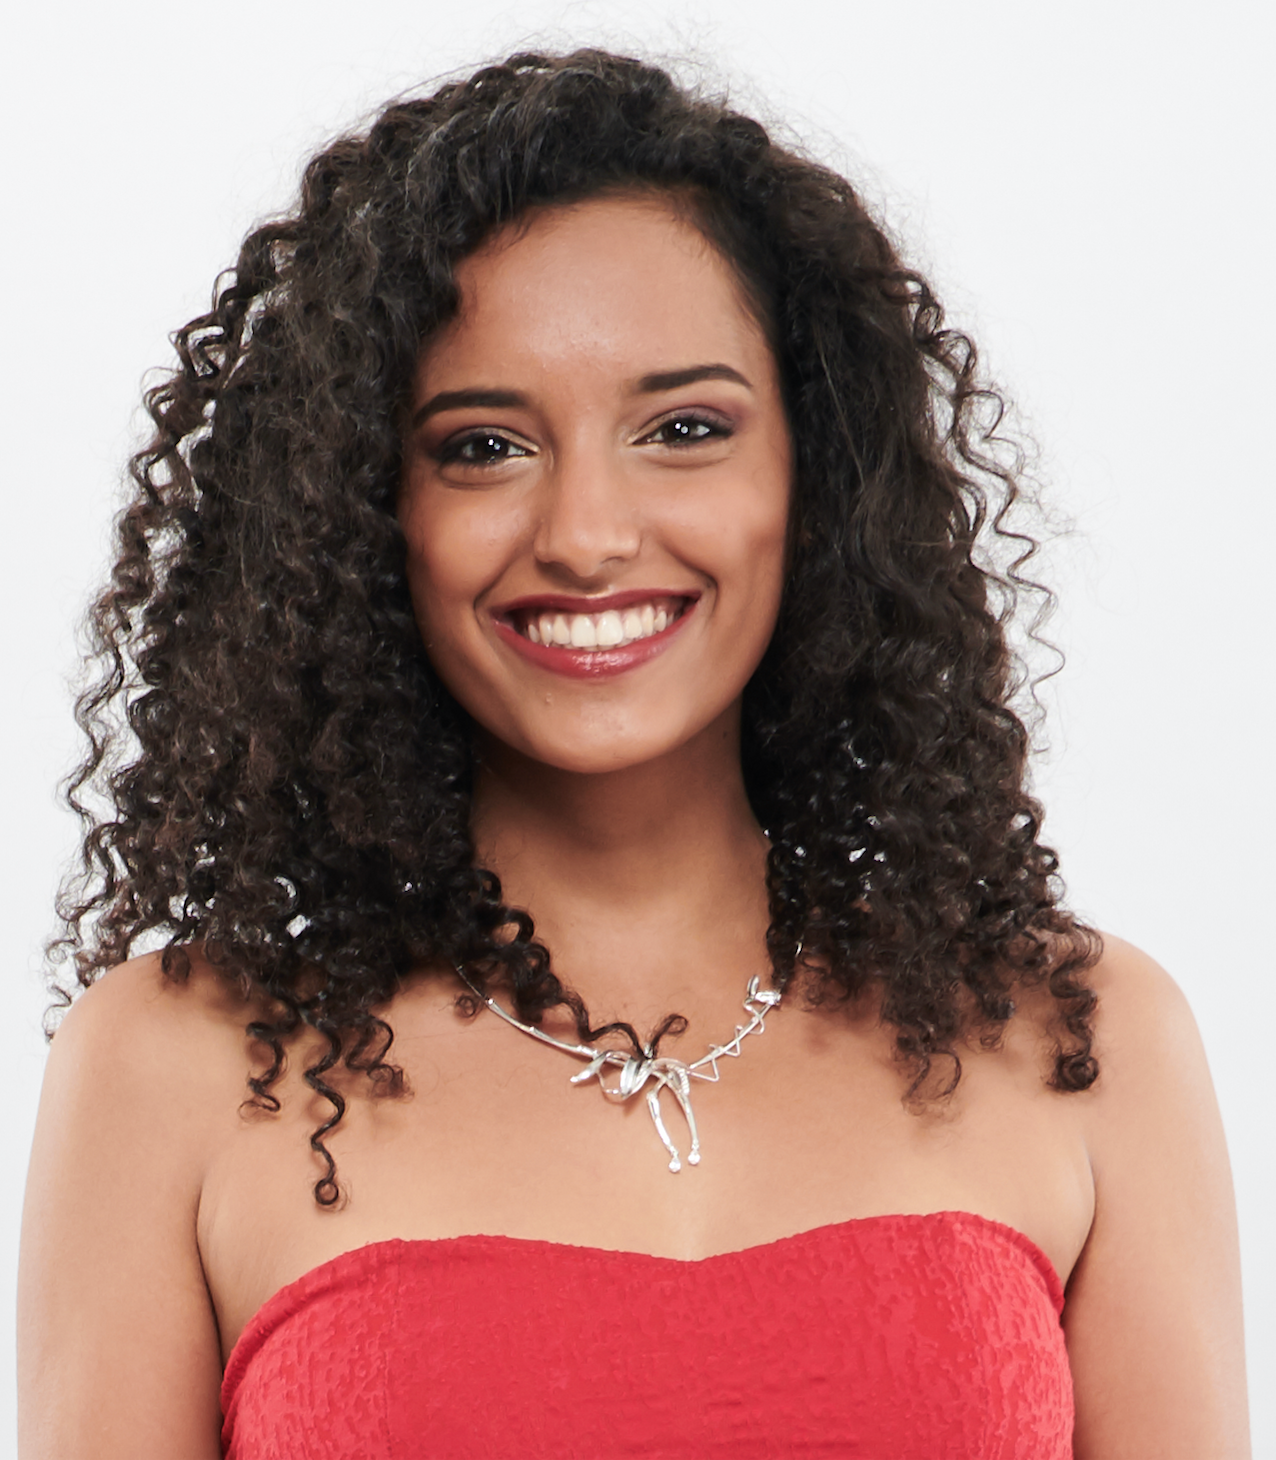 N°5. Elisa Villard - 20 ans, 1,71m - Saint-Pierre